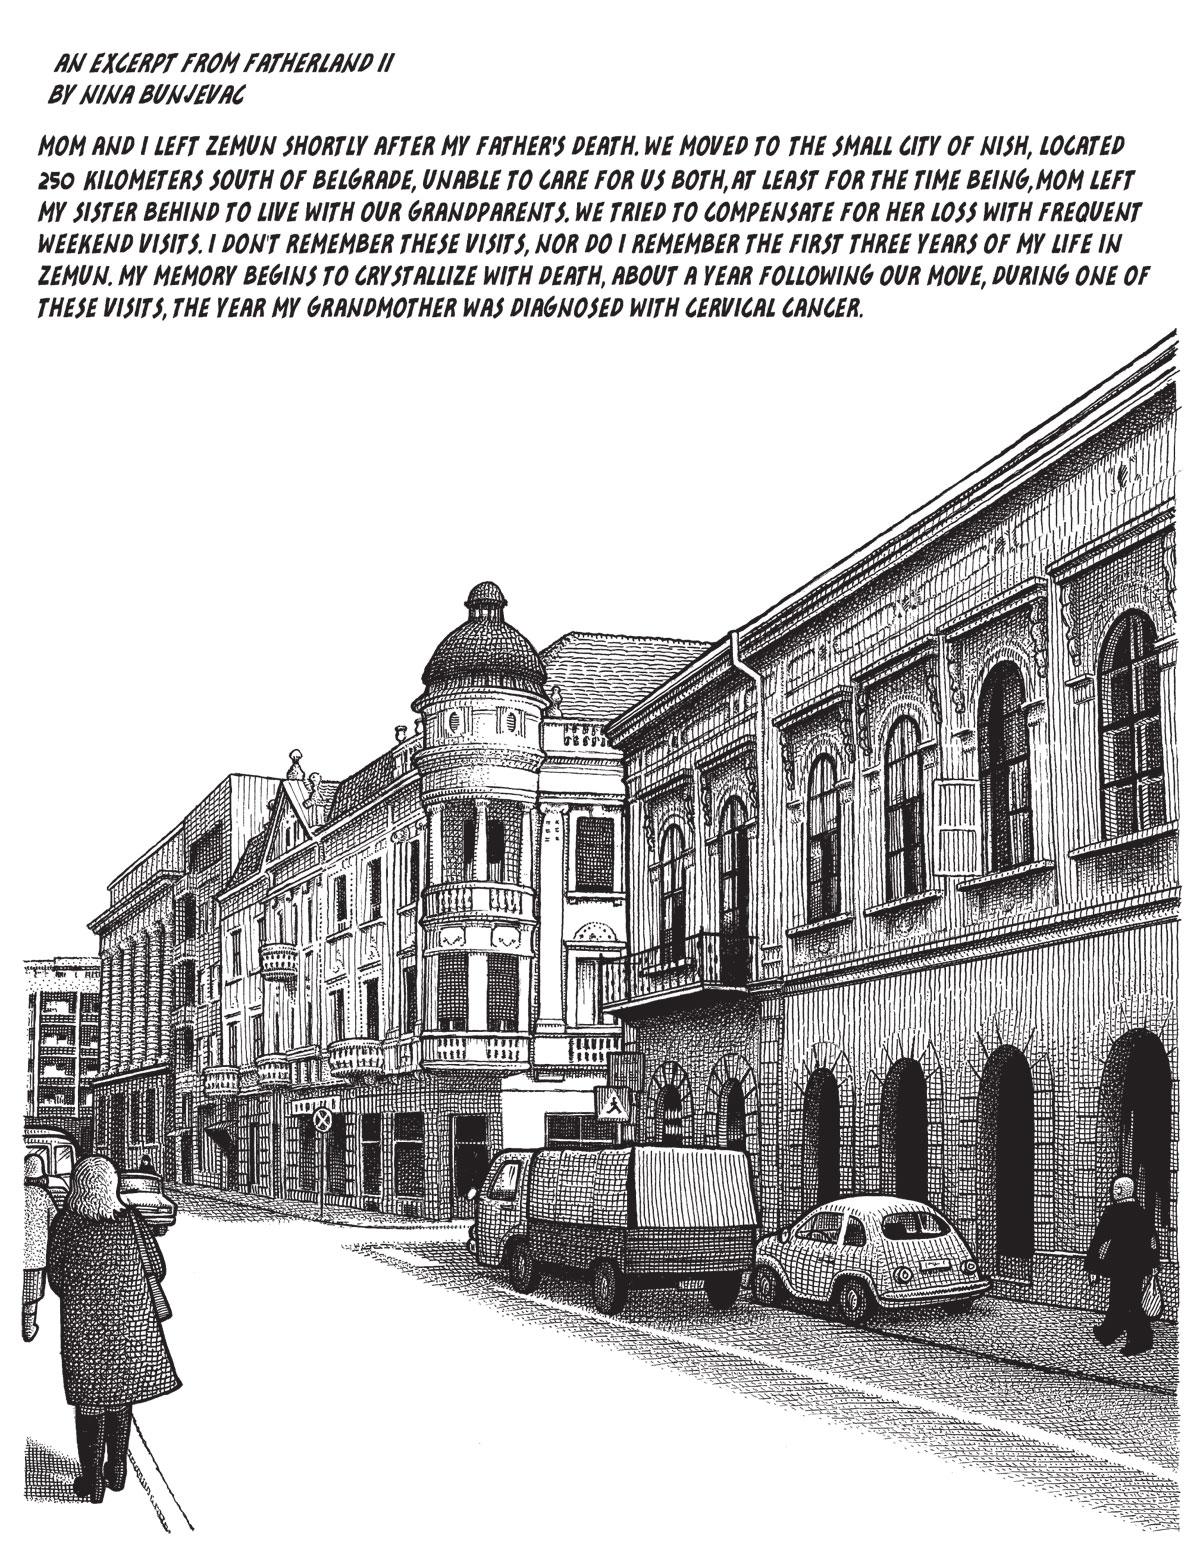 Comic by Nina Bunjevac